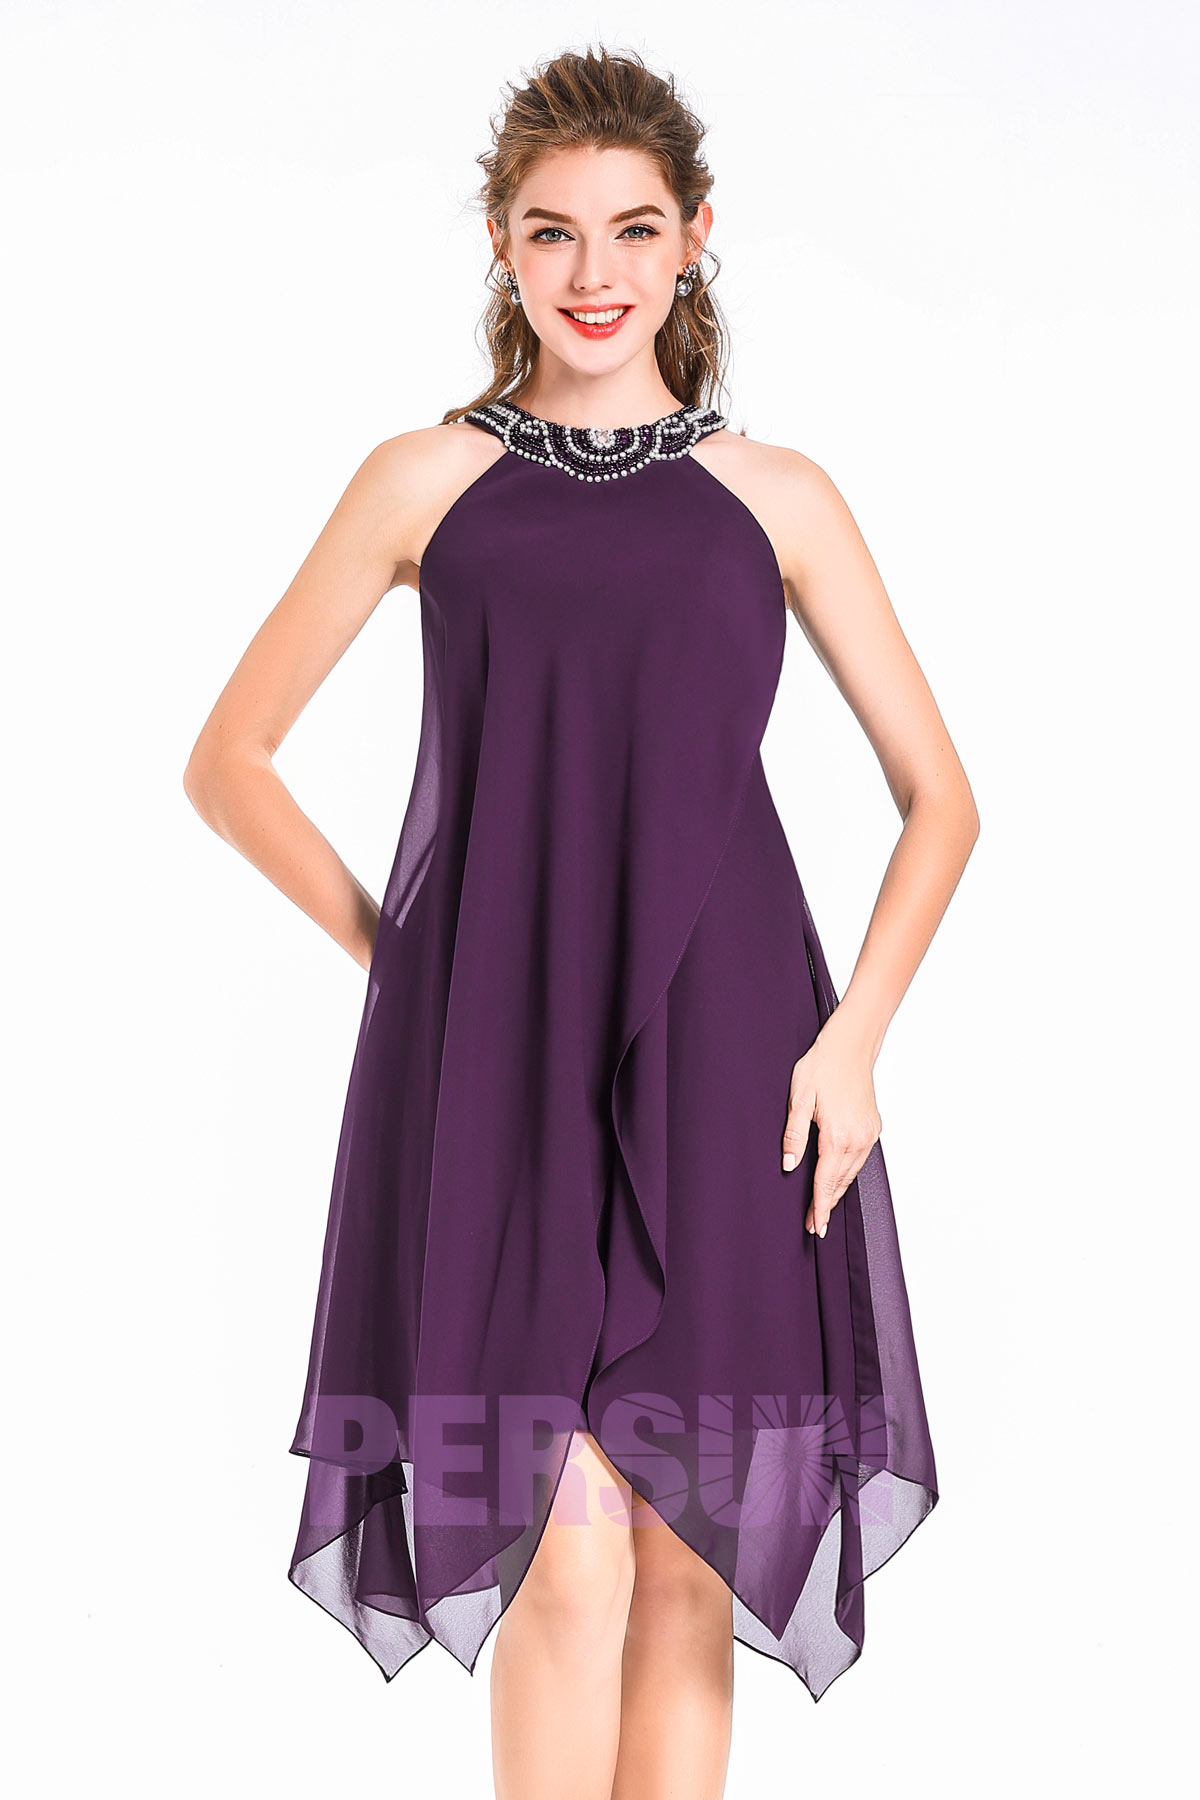 robe de cocktail courte prune col halter ornée de bijoux jupe irrégulière